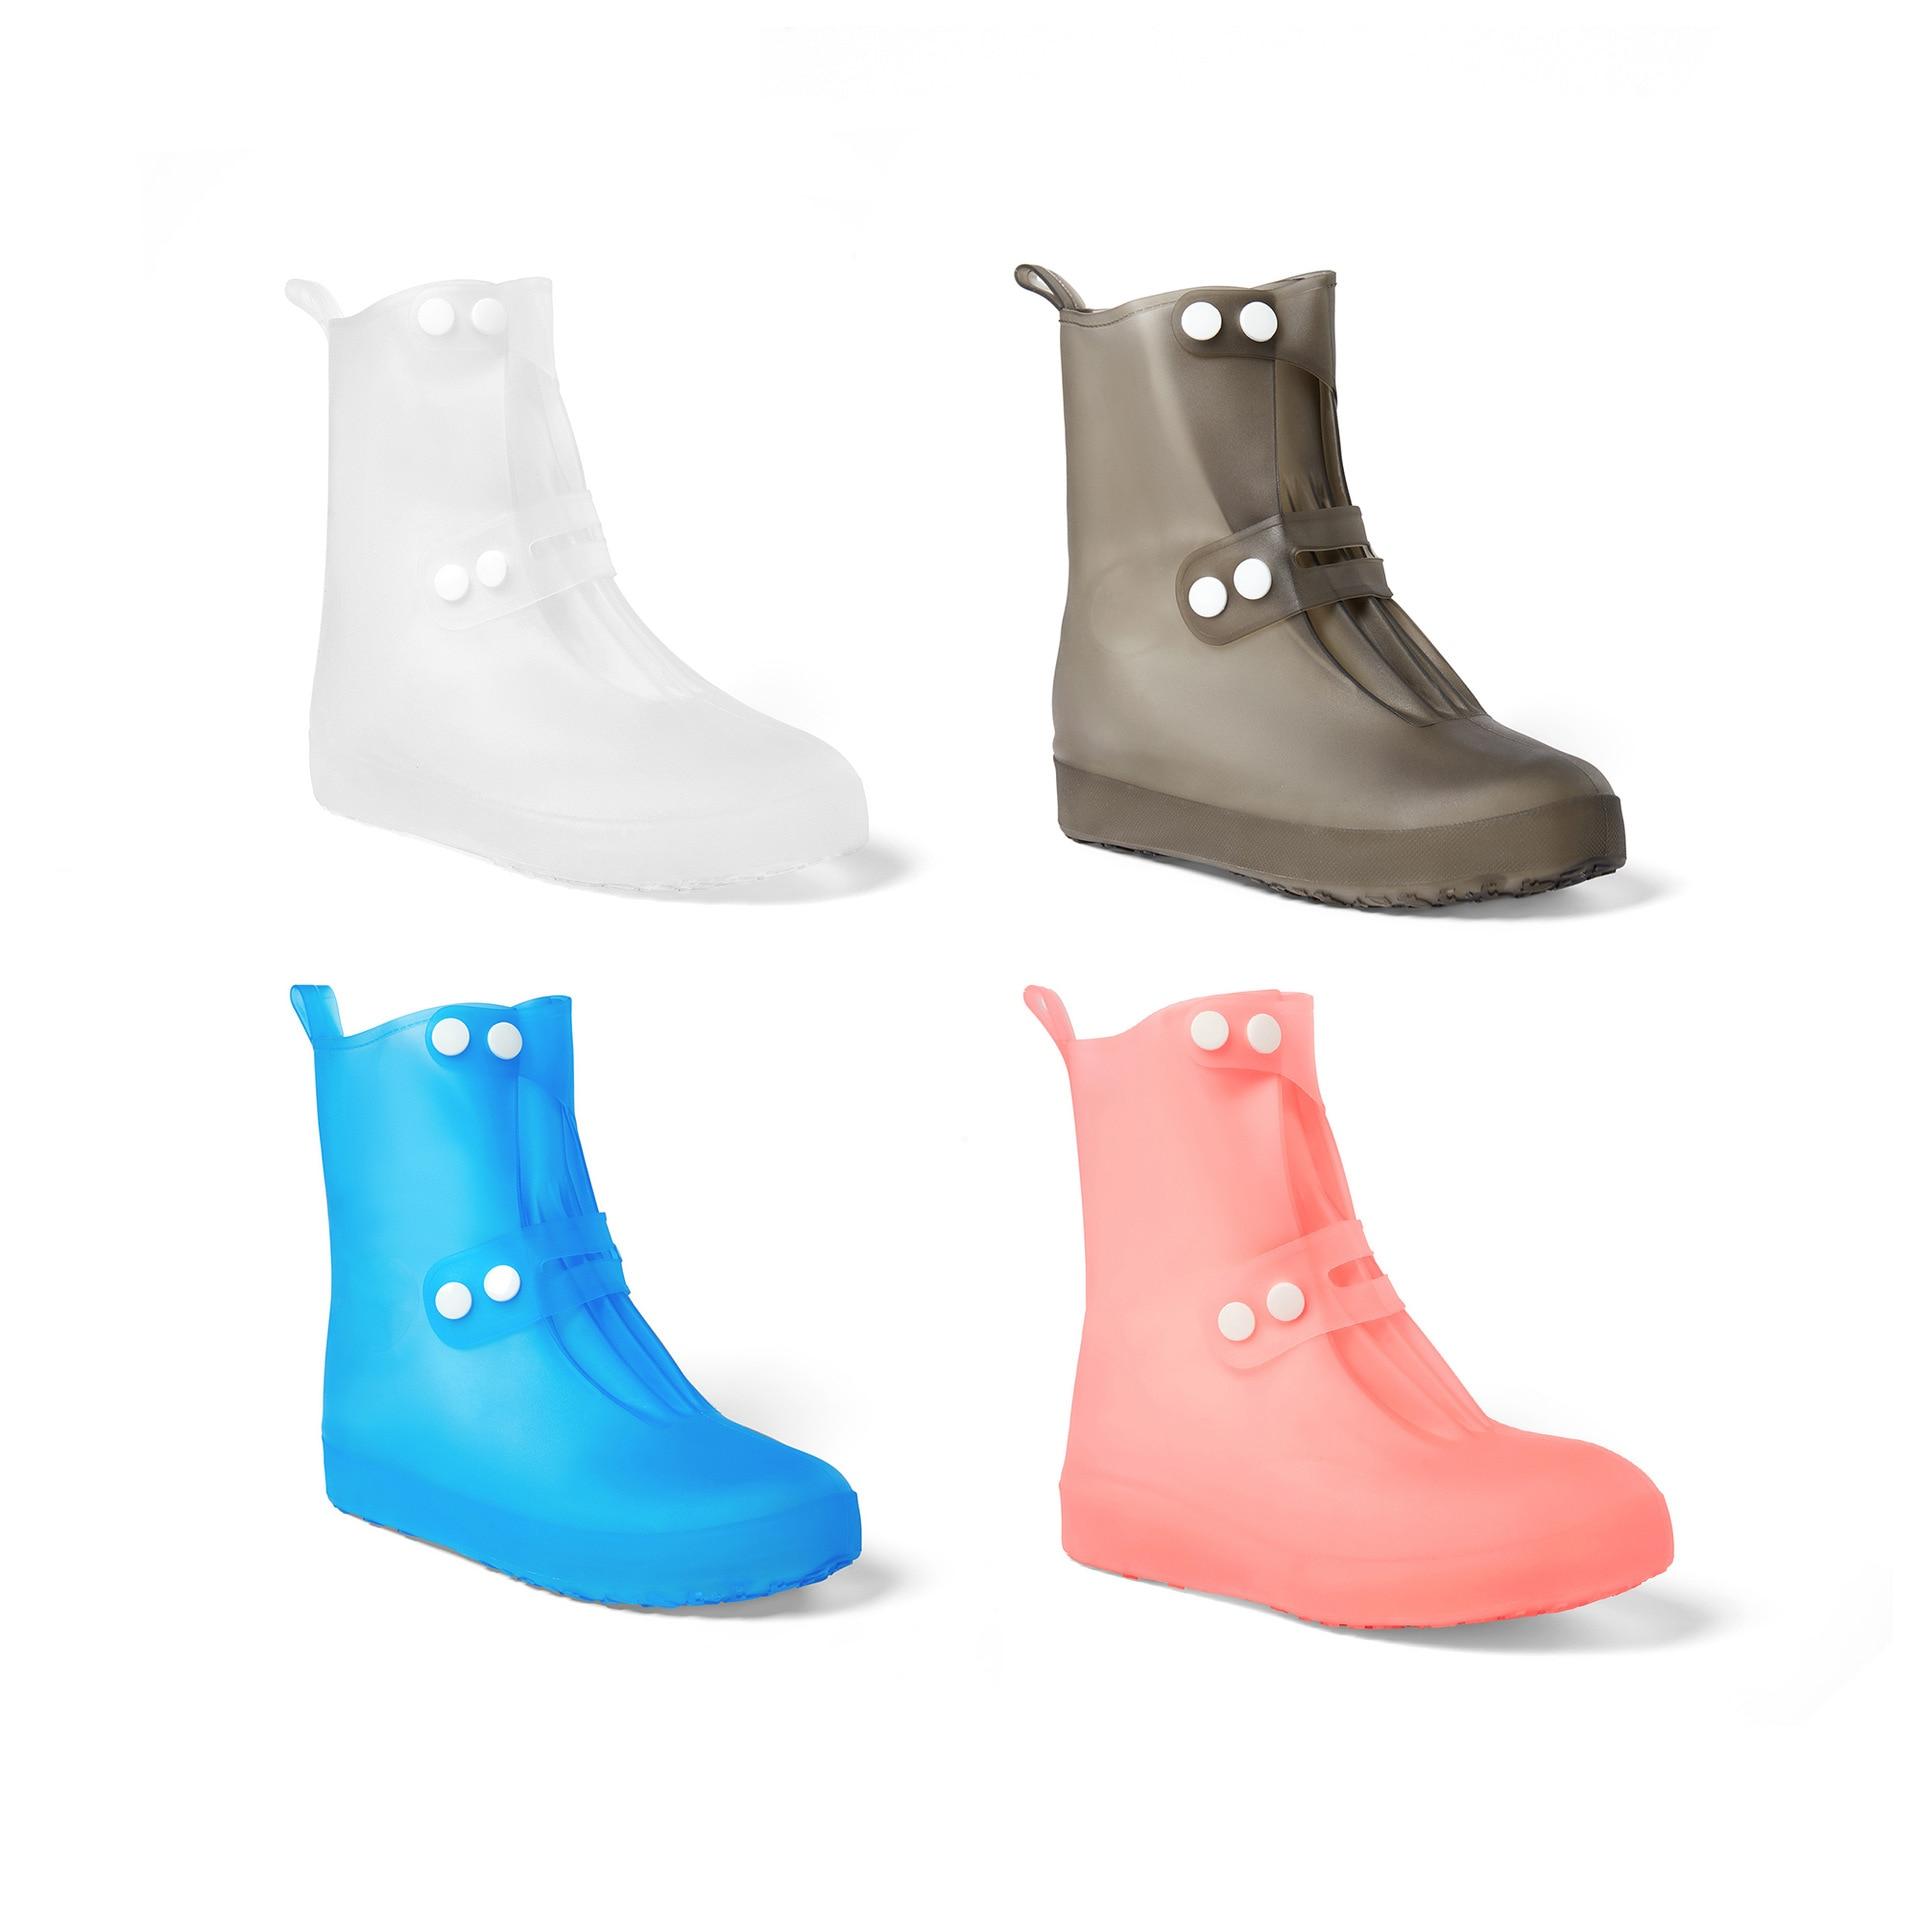 Zapatos de lluvia impermeables de PVC cubre Botas de lluvia reutilizables cubiertas Unisex antideslizante elástico Zapatos Accesorios Mochilas de ortopedia para niños 2019, mochilas para niños, mochilas para niños en primaria, mochilas impermeables para niñas y niños, mochilas infantiles